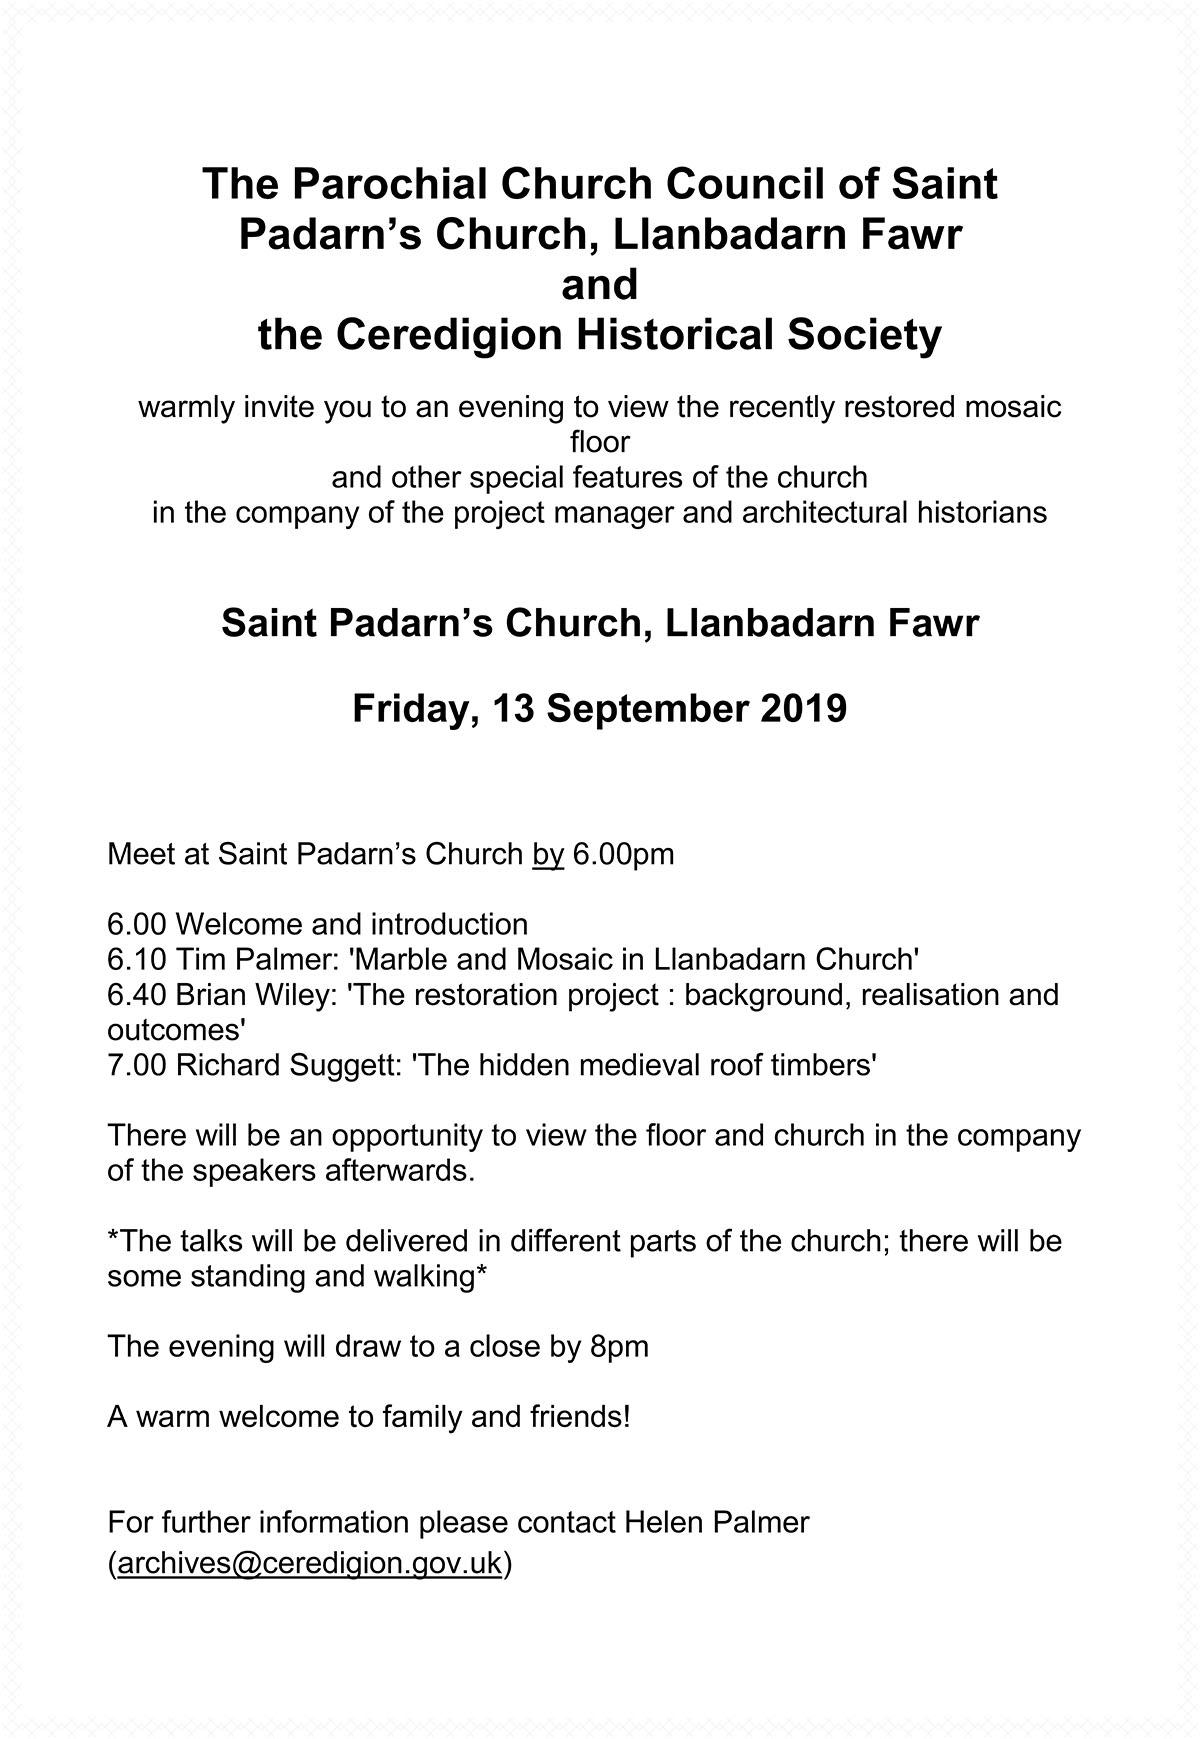 The Parochial Church Council of Saint Padarn's Church, Llanbadarn Fawr and the Ceredigion Historical Society